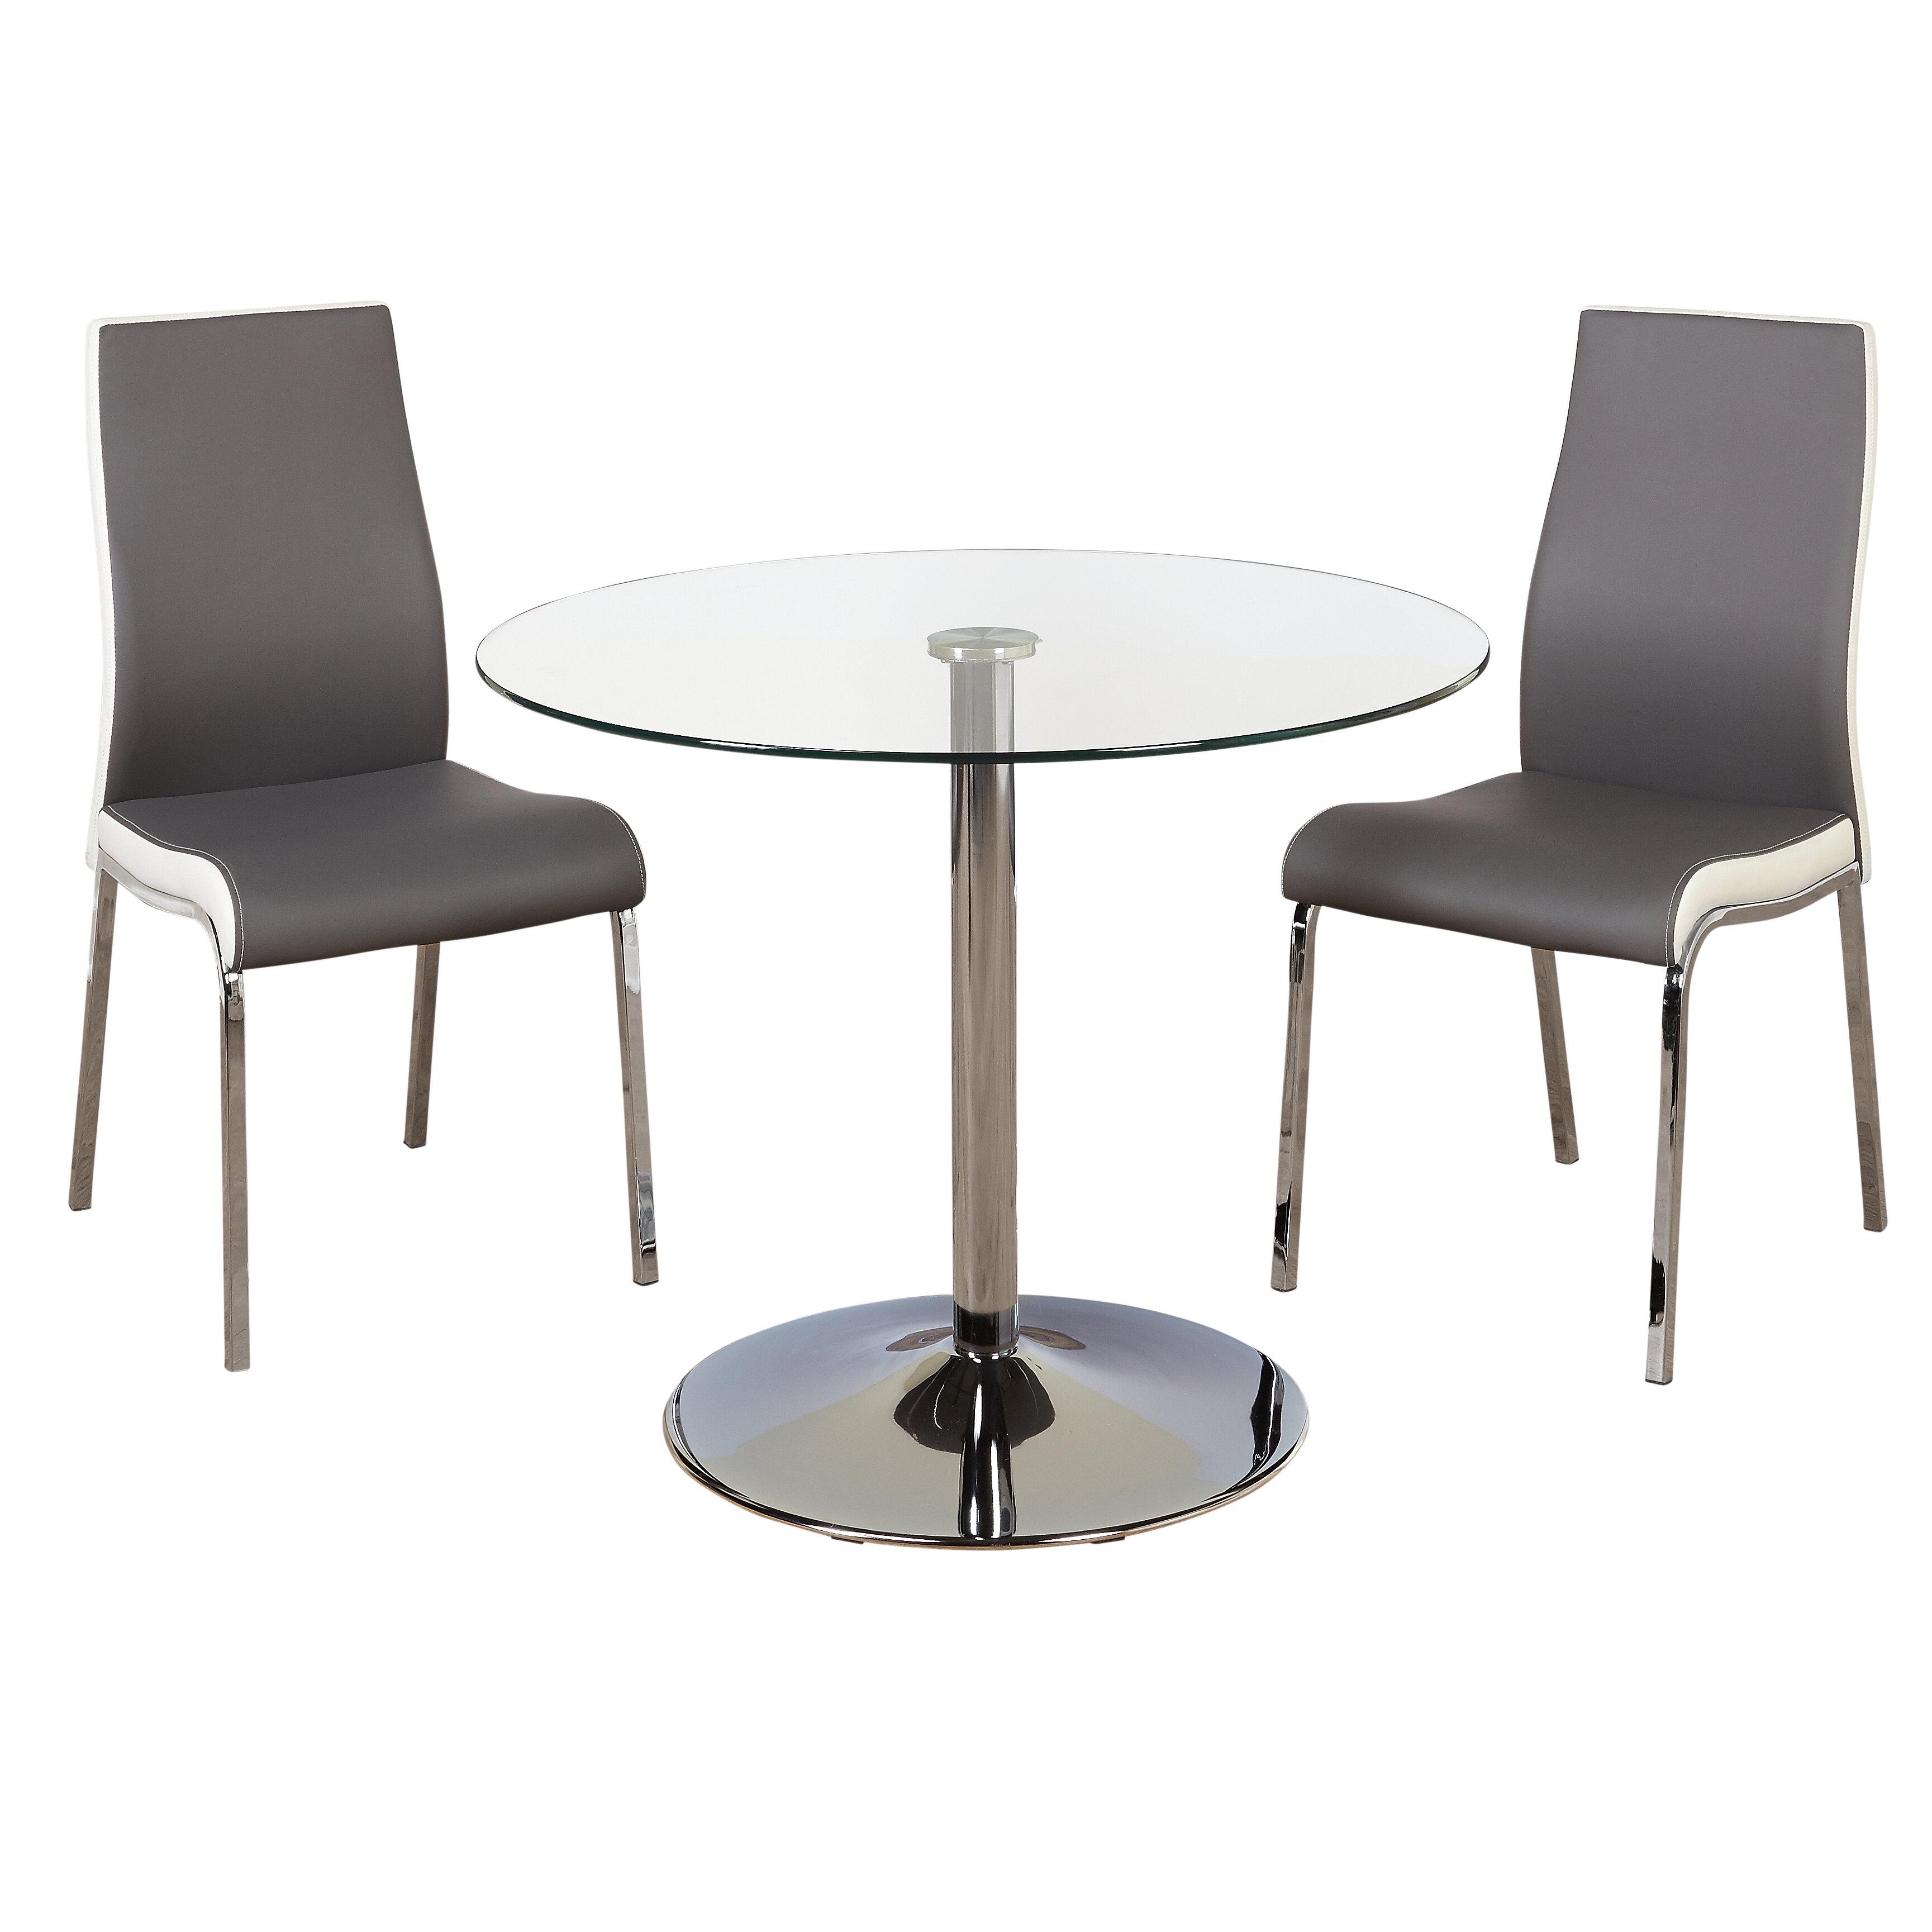 Pleasing Salerno 3 Piece Dining Set Creativecarmelina Interior Chair Design Creativecarmelinacom